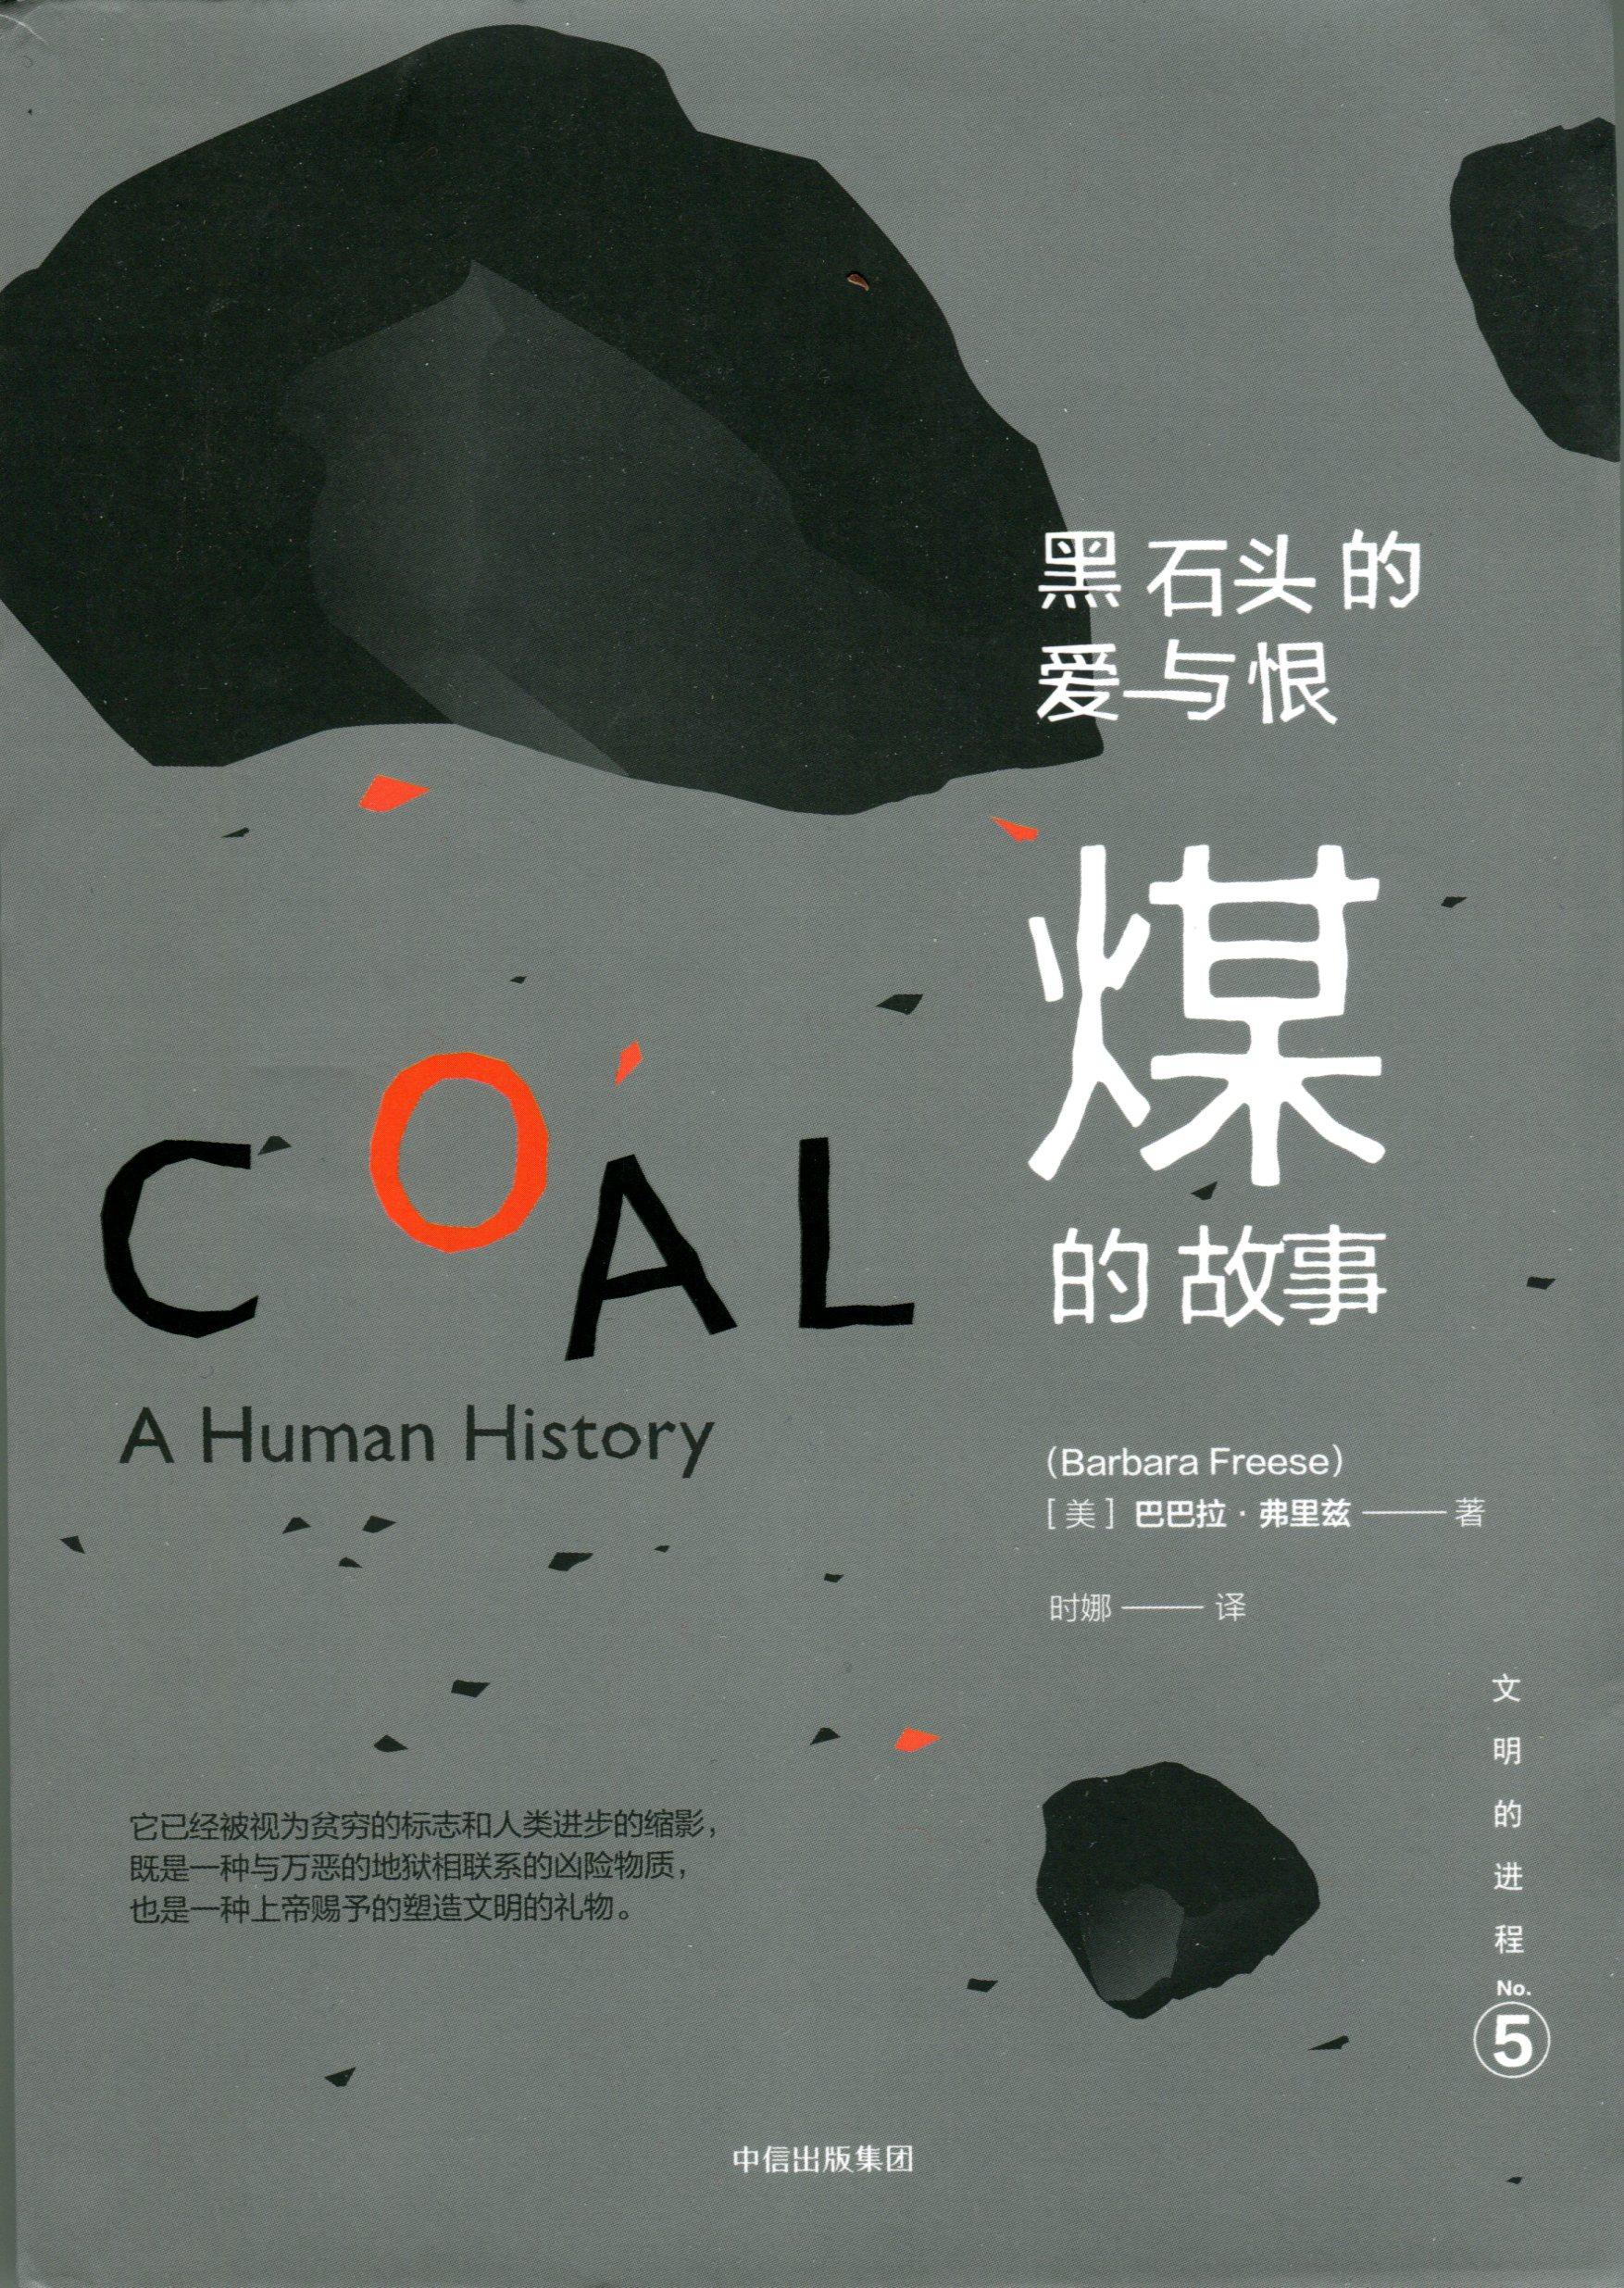 Coal Chinese cover127.jpg